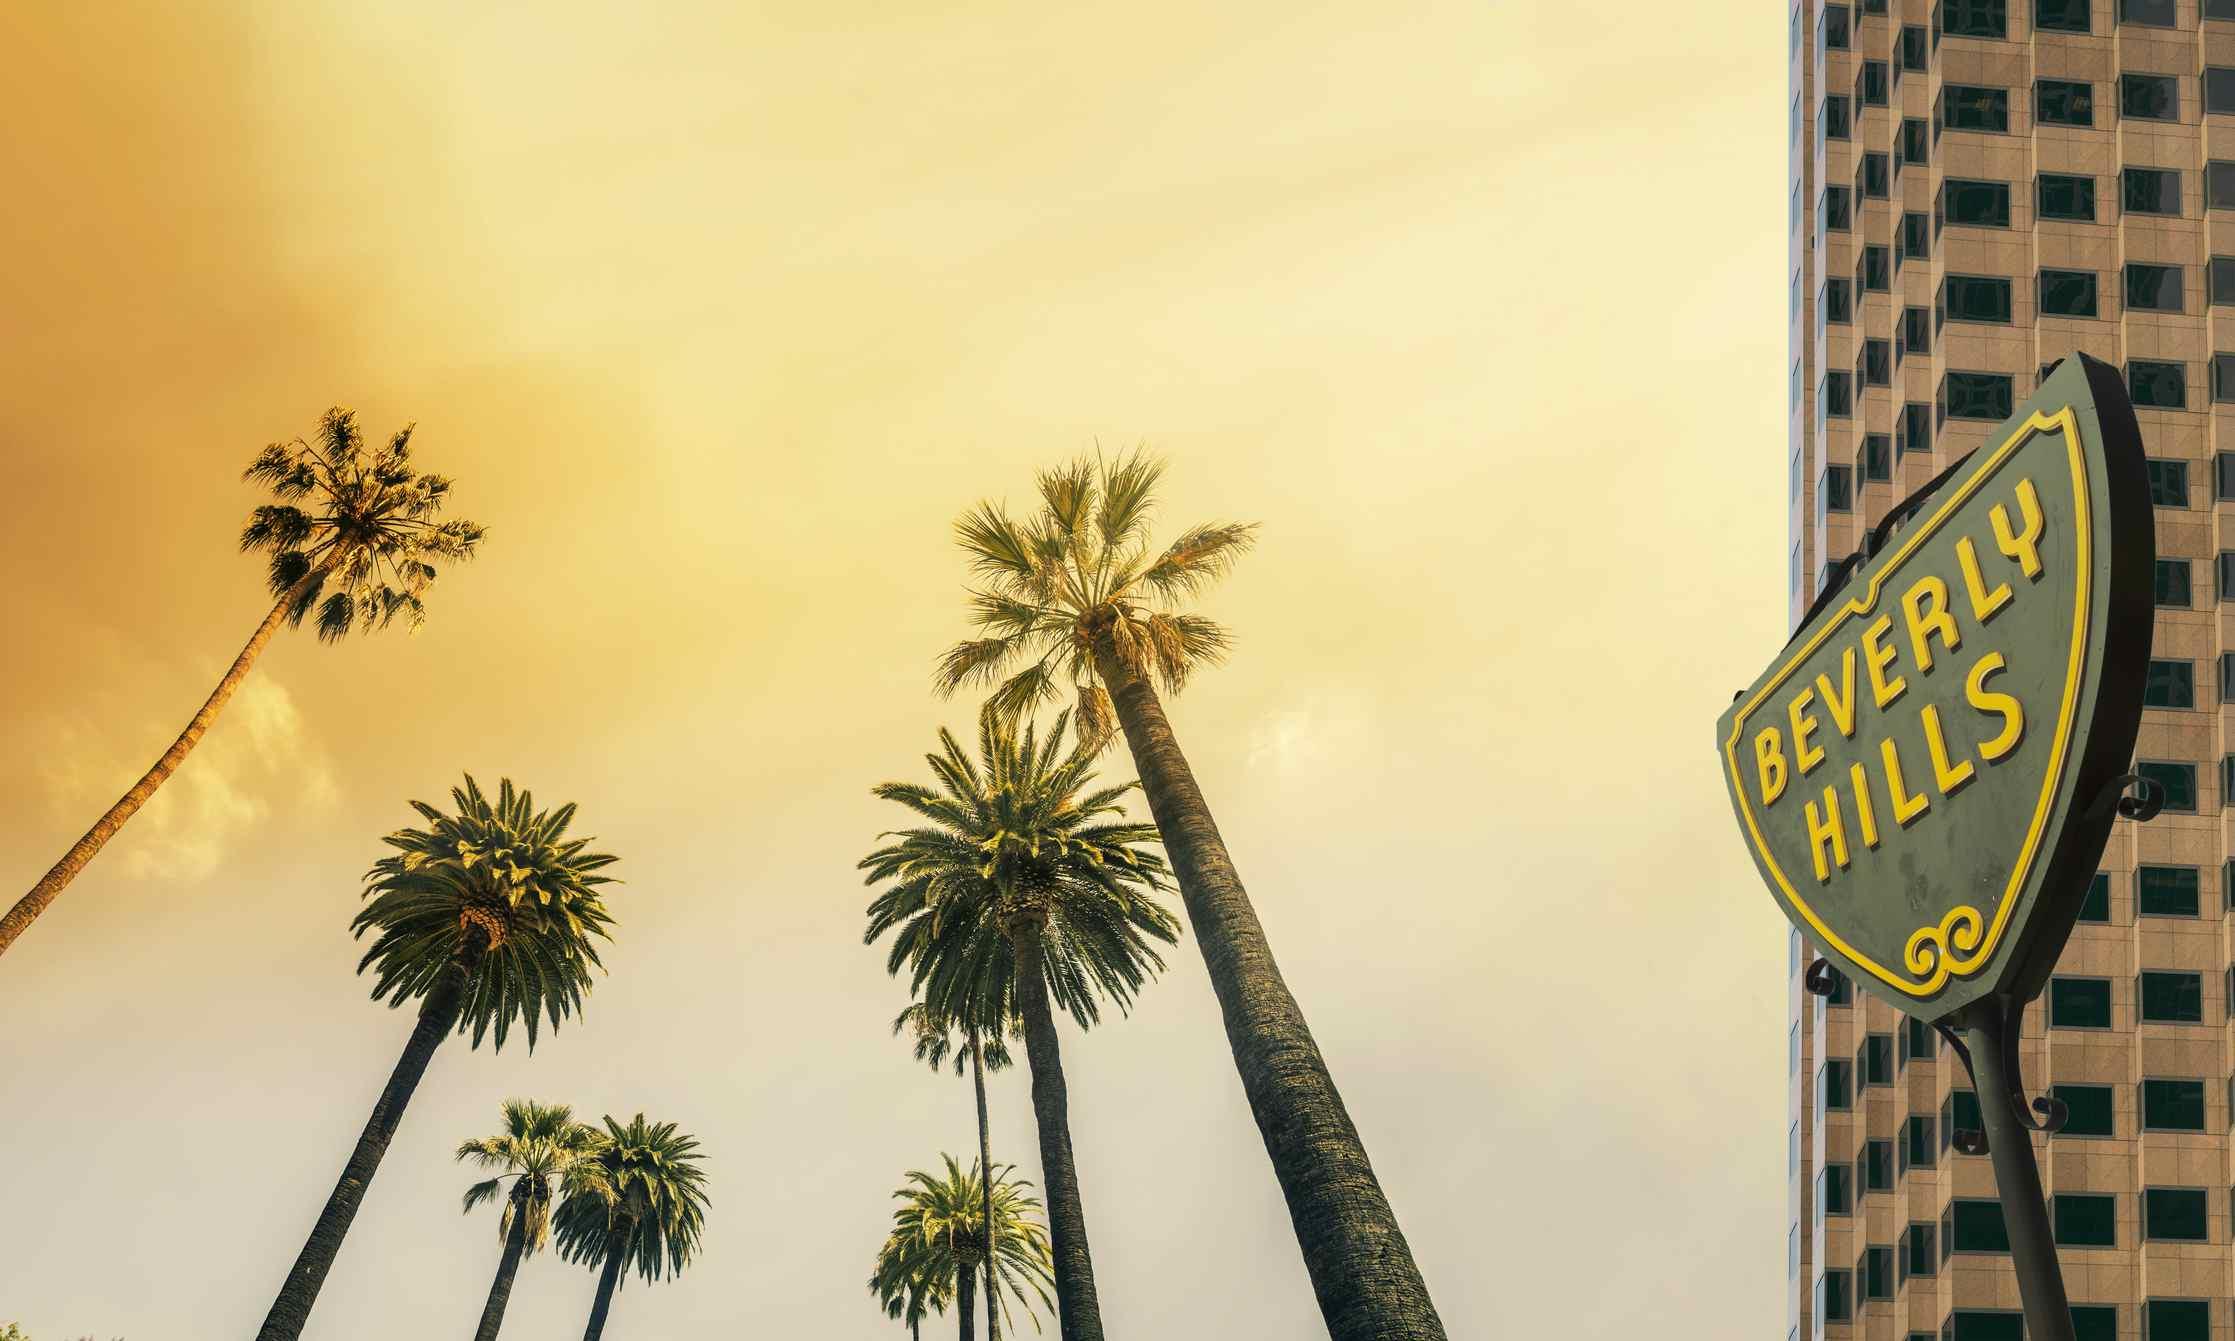 Beverly Hills,West Coast Palm Tree Sunshine